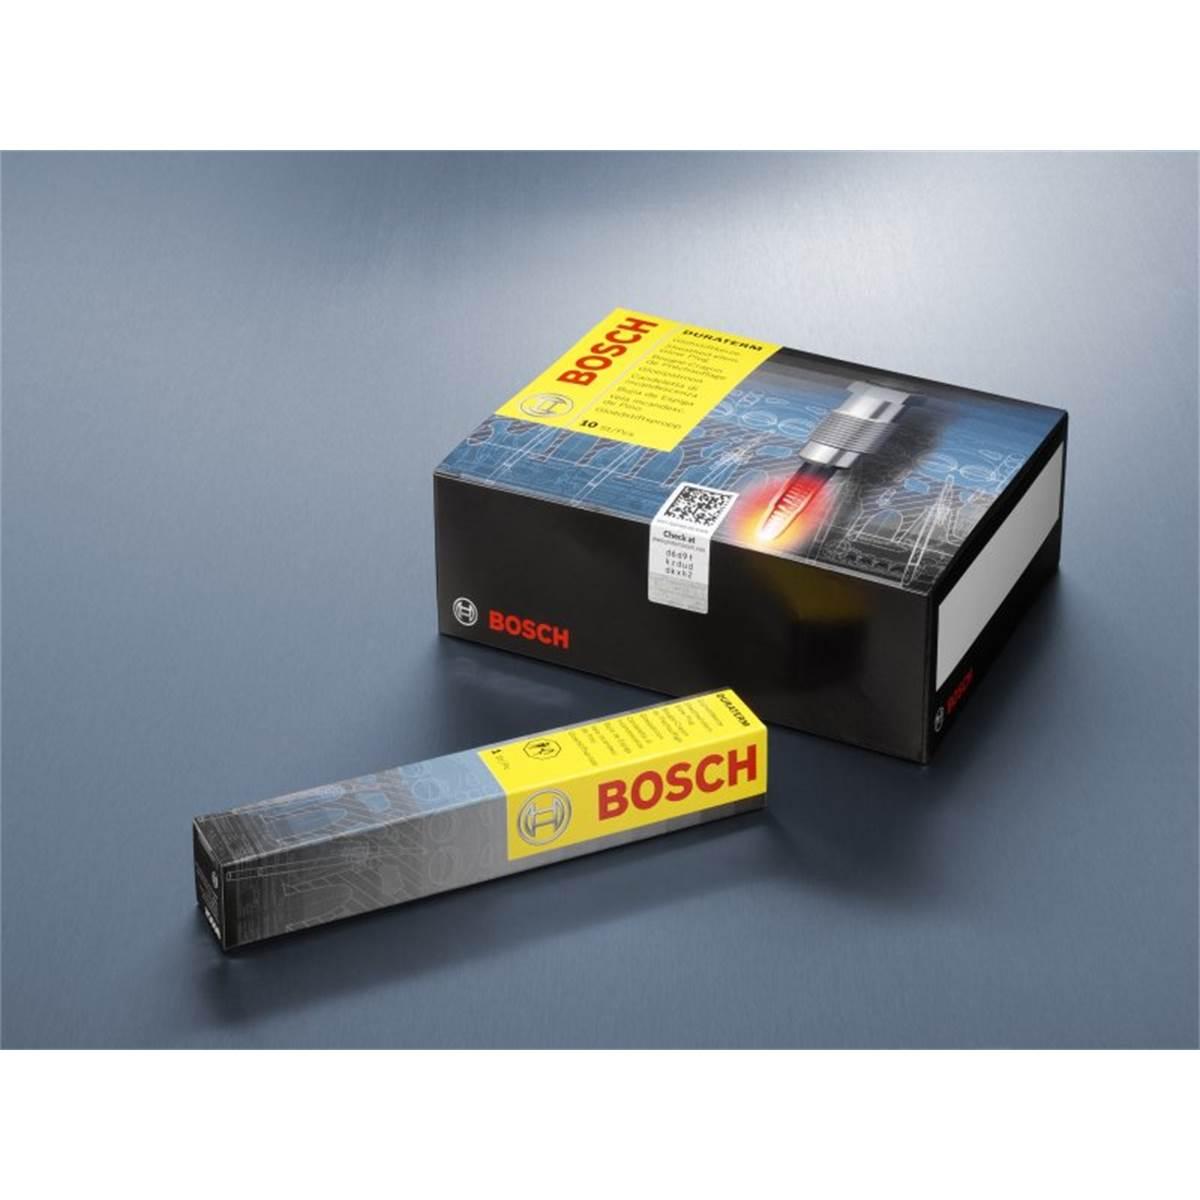 Bougie de préchauffage Bosch N°2001